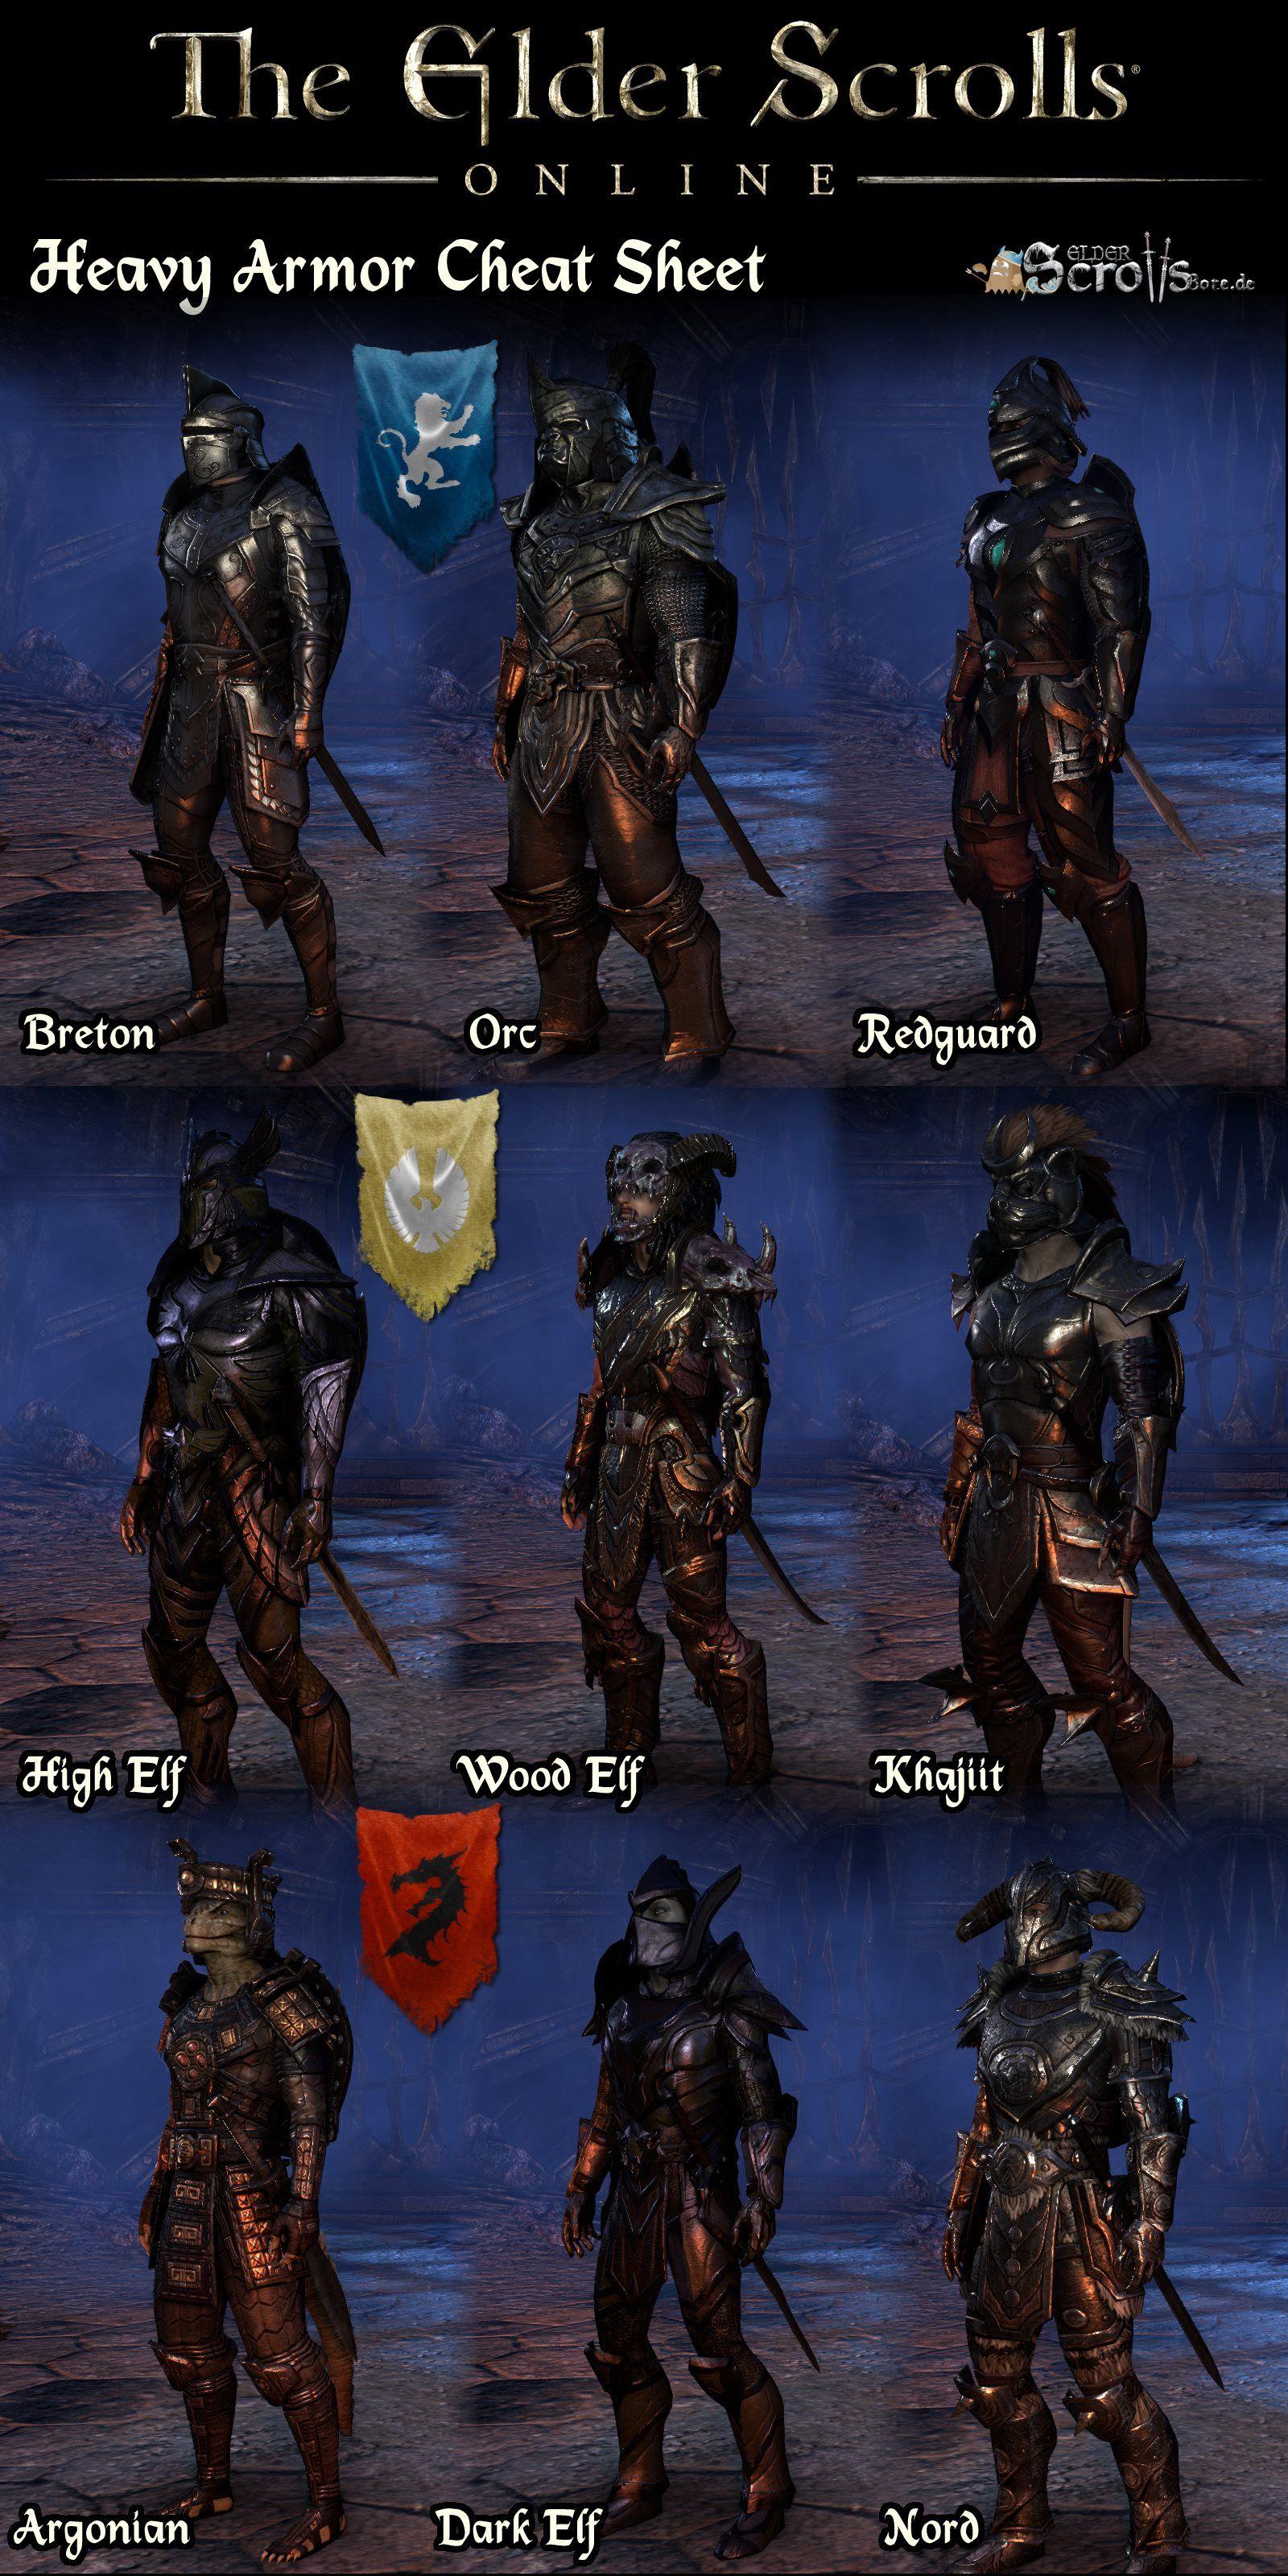 Heavy armour style by race - The Elder Scrolls Online